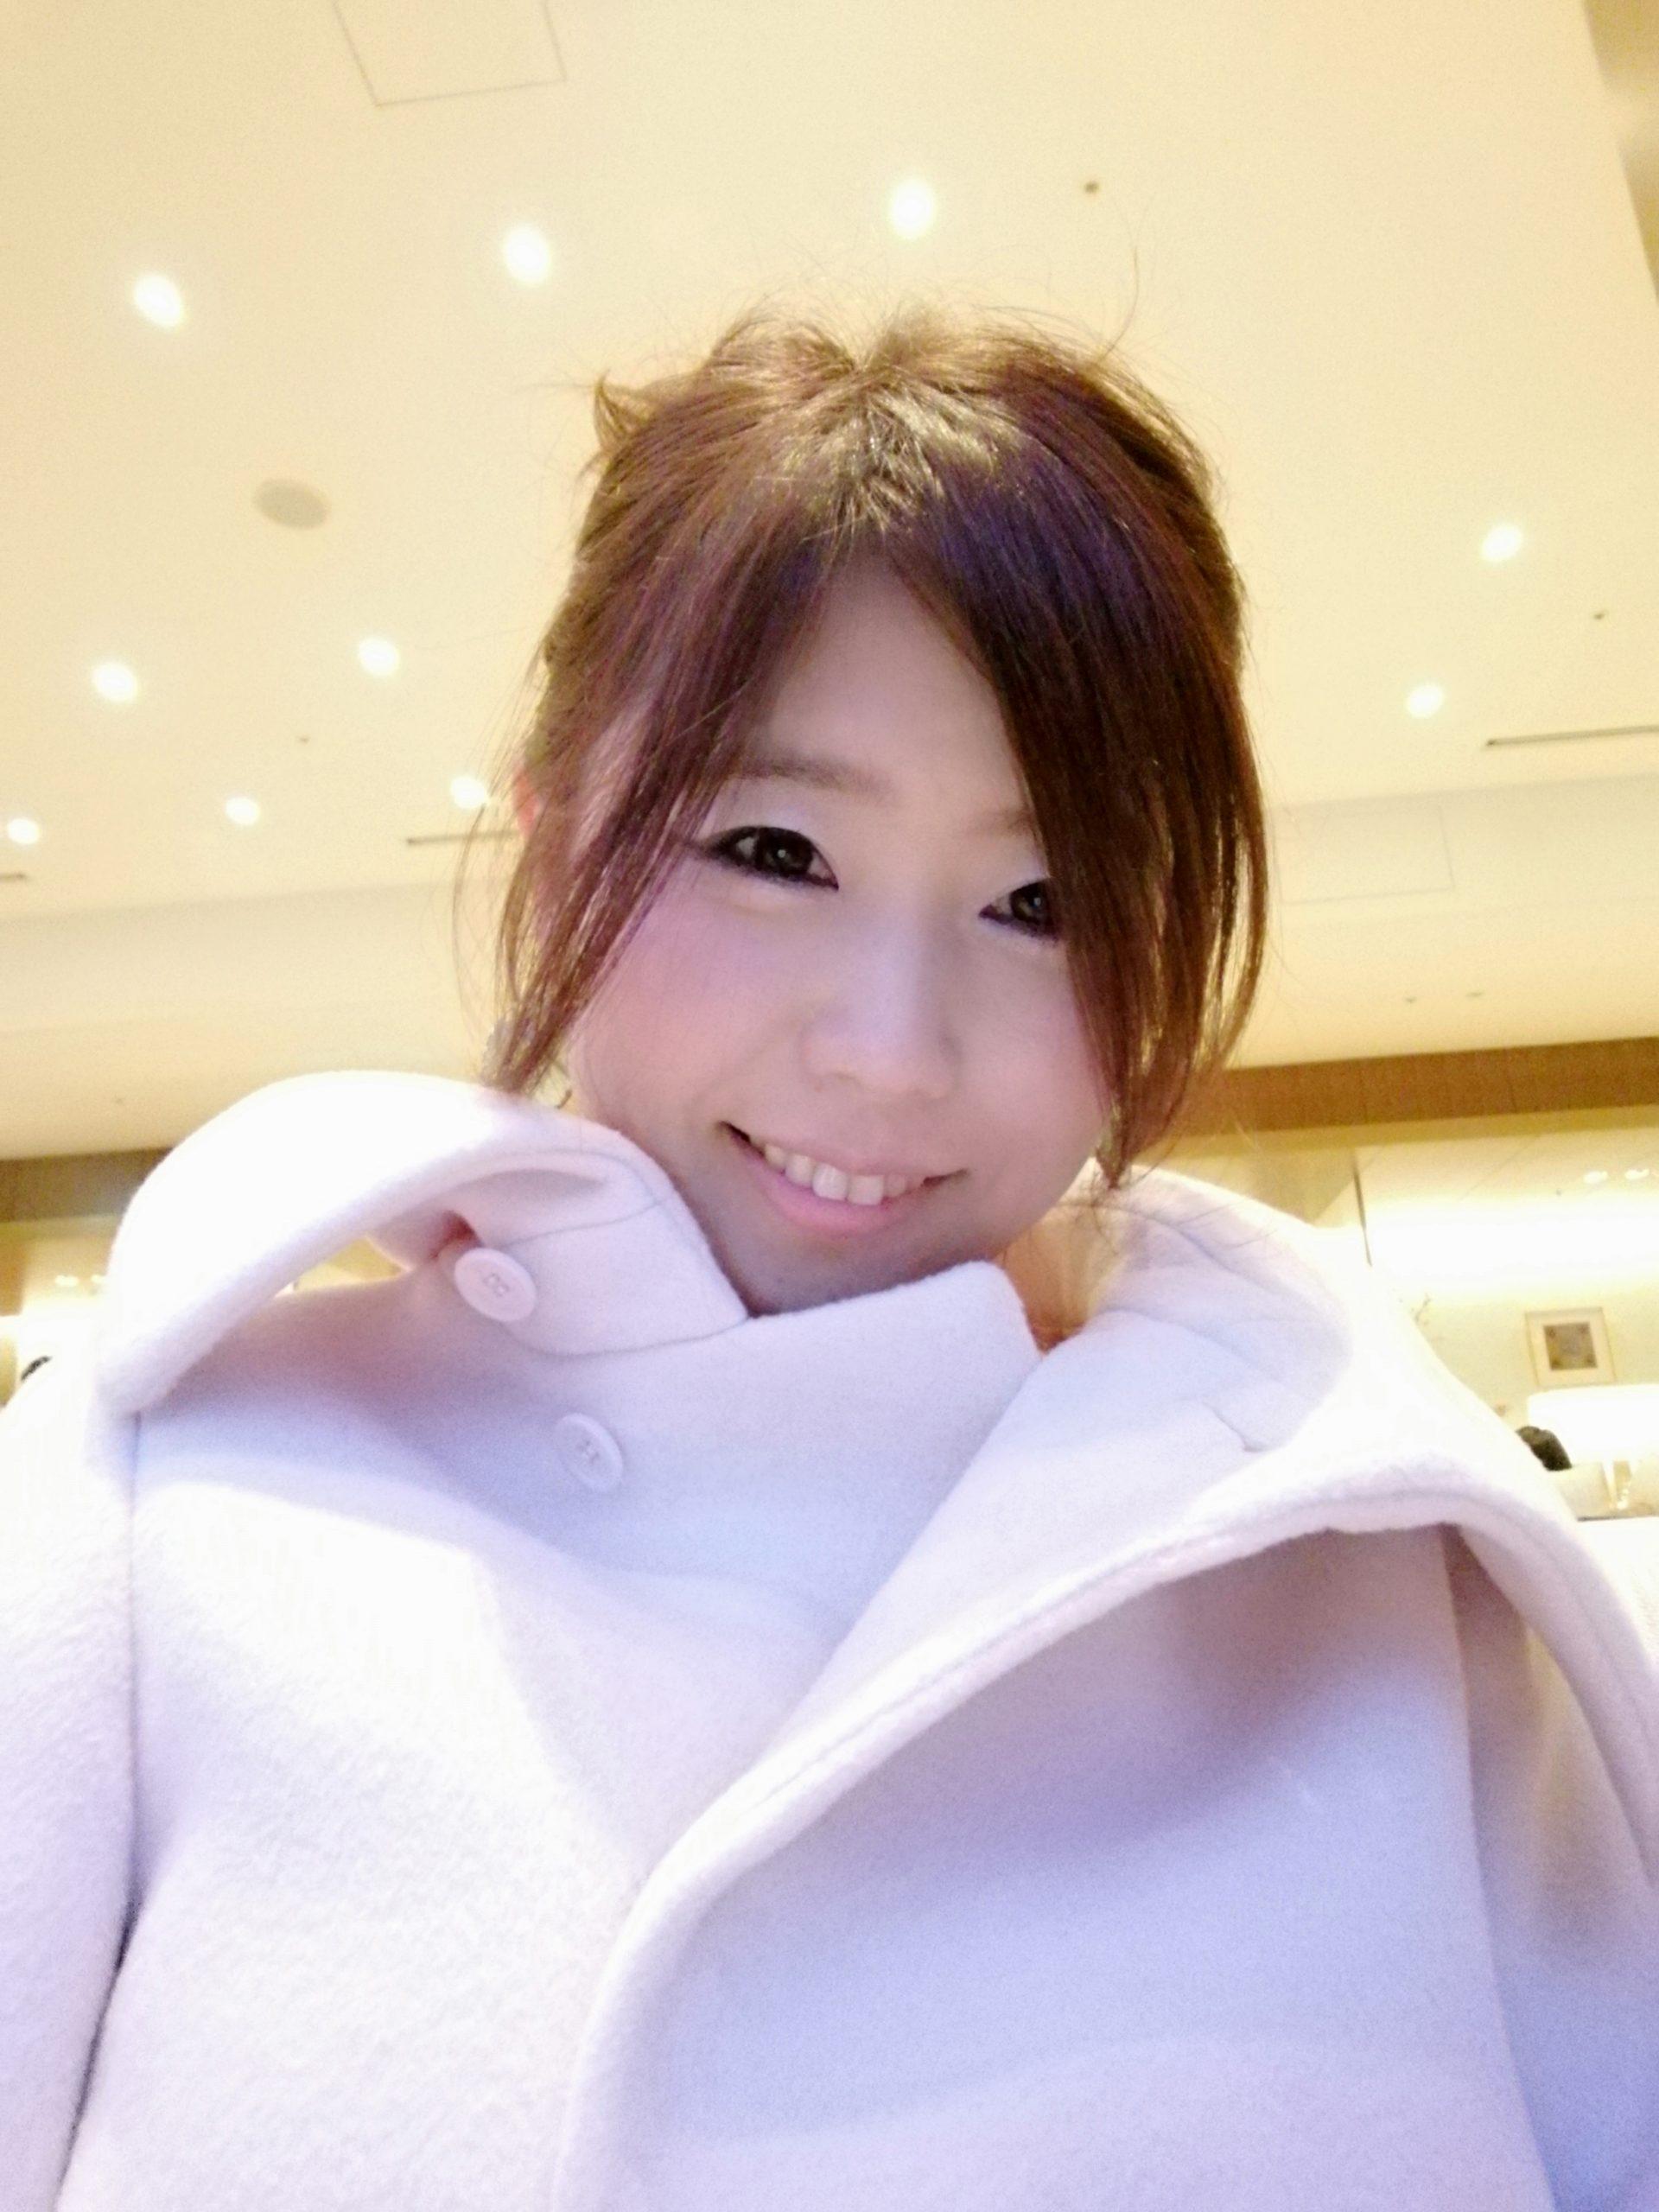 Shining_Erika